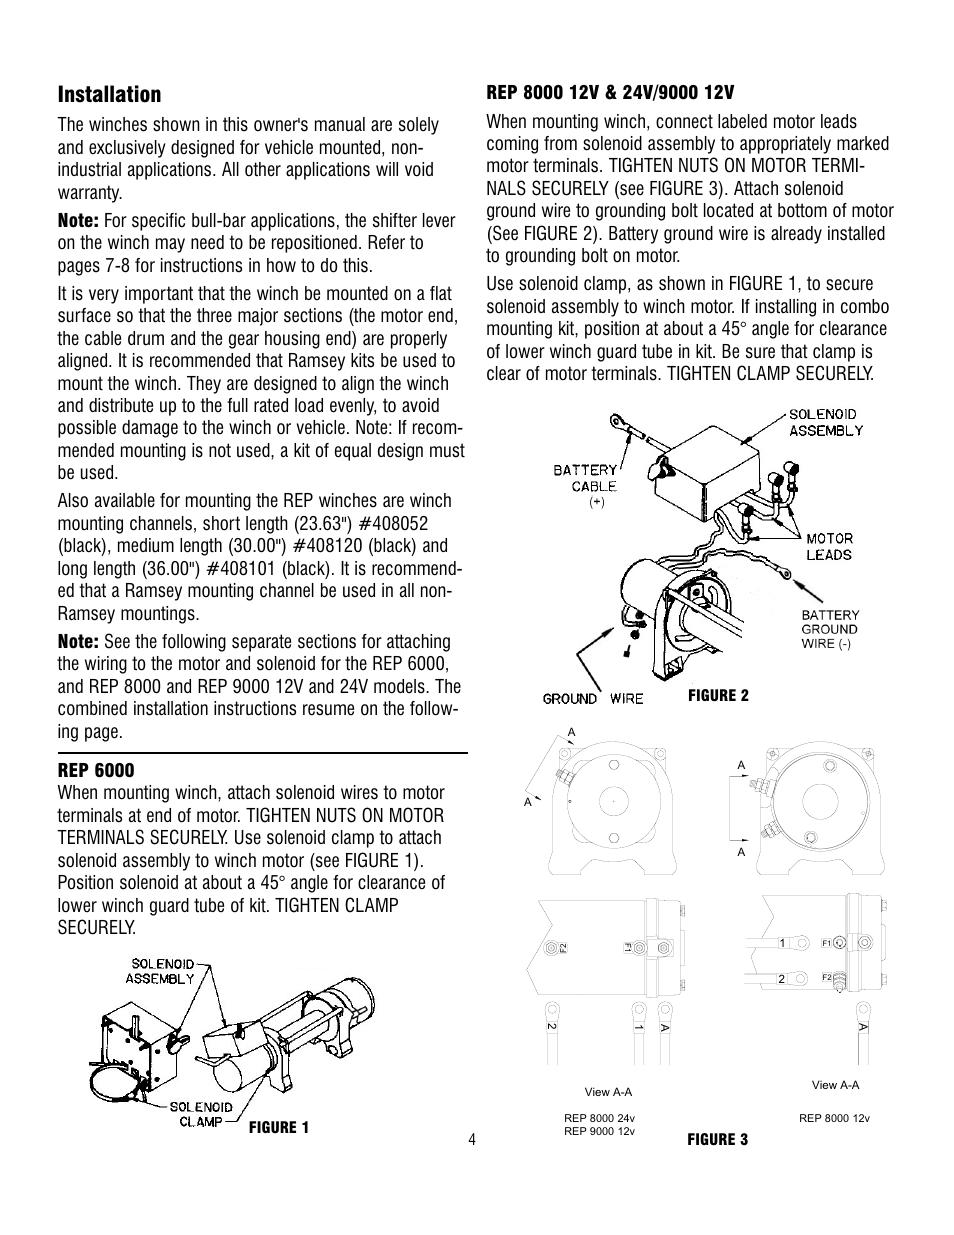 desert dynamics, warn m6000, warn rt25, on 2 post winch motor wiring diagram